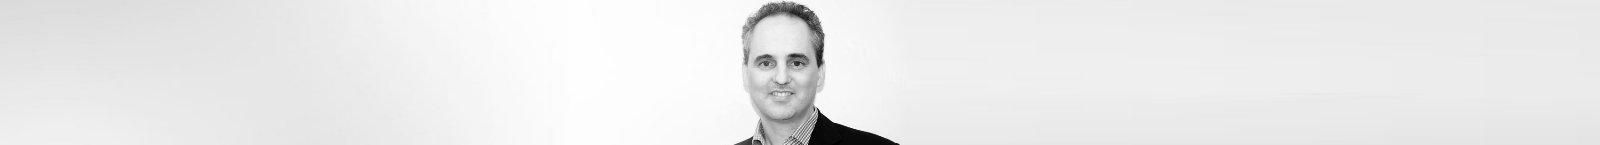 Hickman James South West Queensland Partner | Shine Lawyers